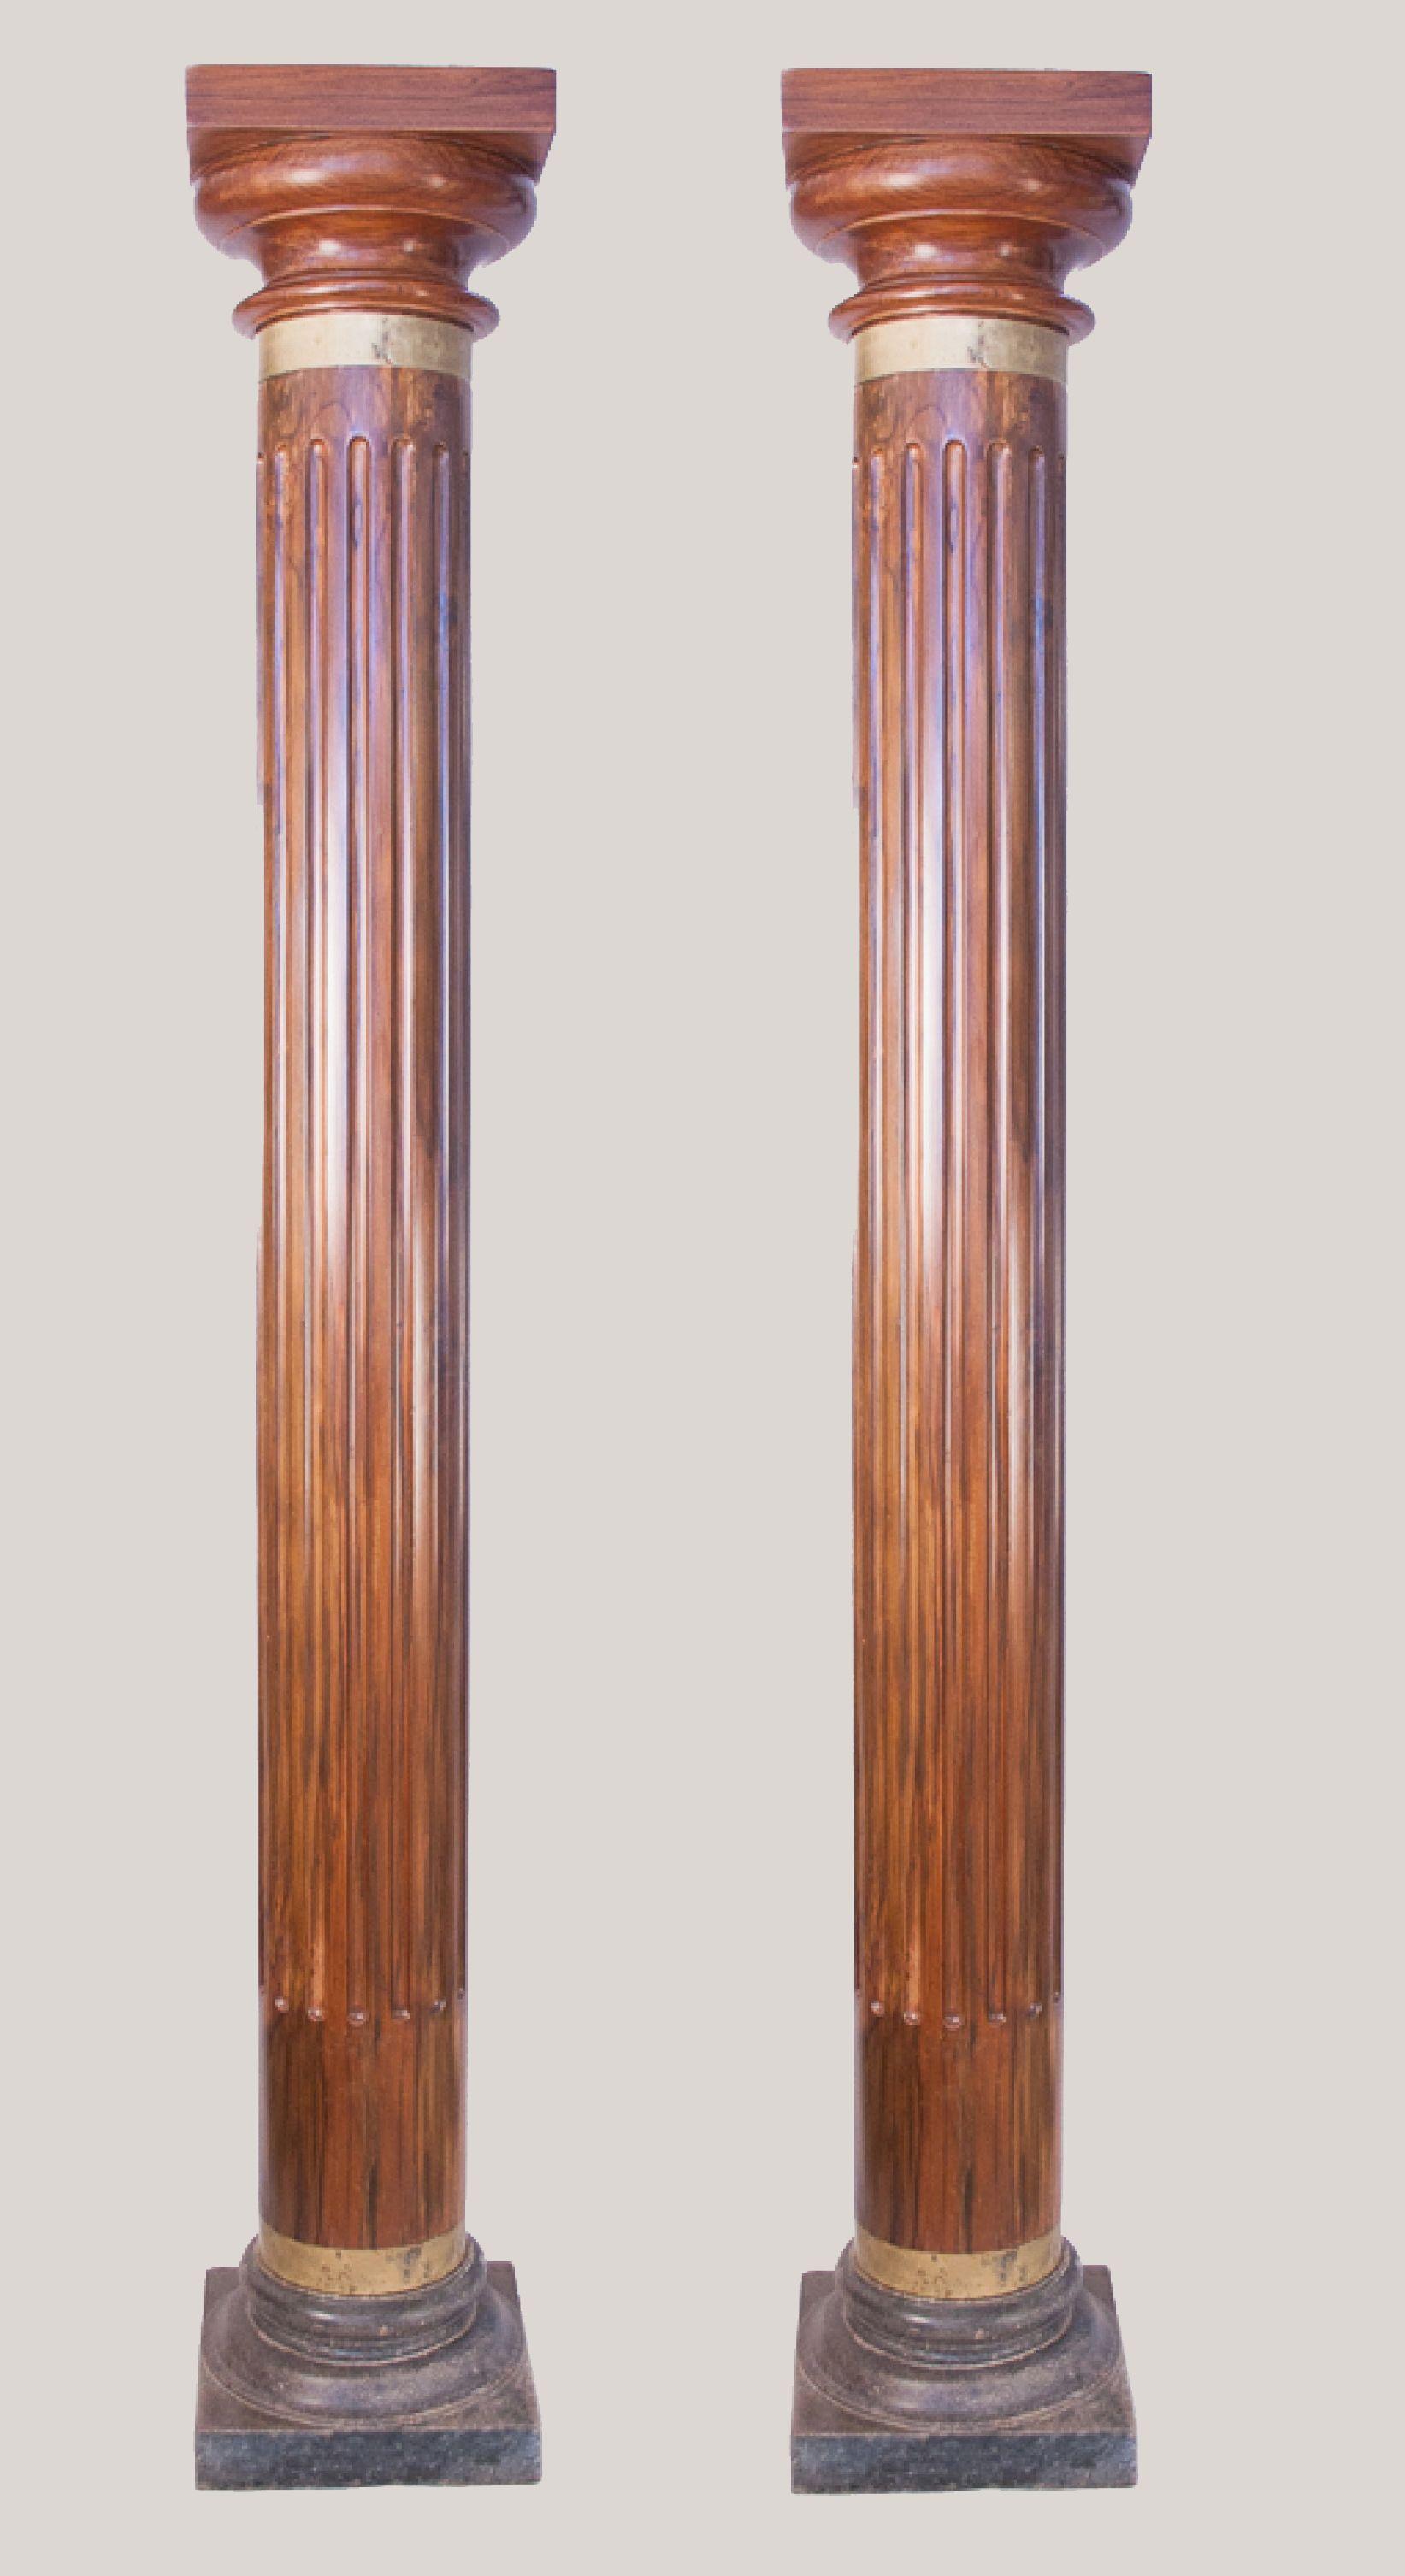 Wood Architectural Columns: Antique Wood Reeded Doric Columns Or Pillars